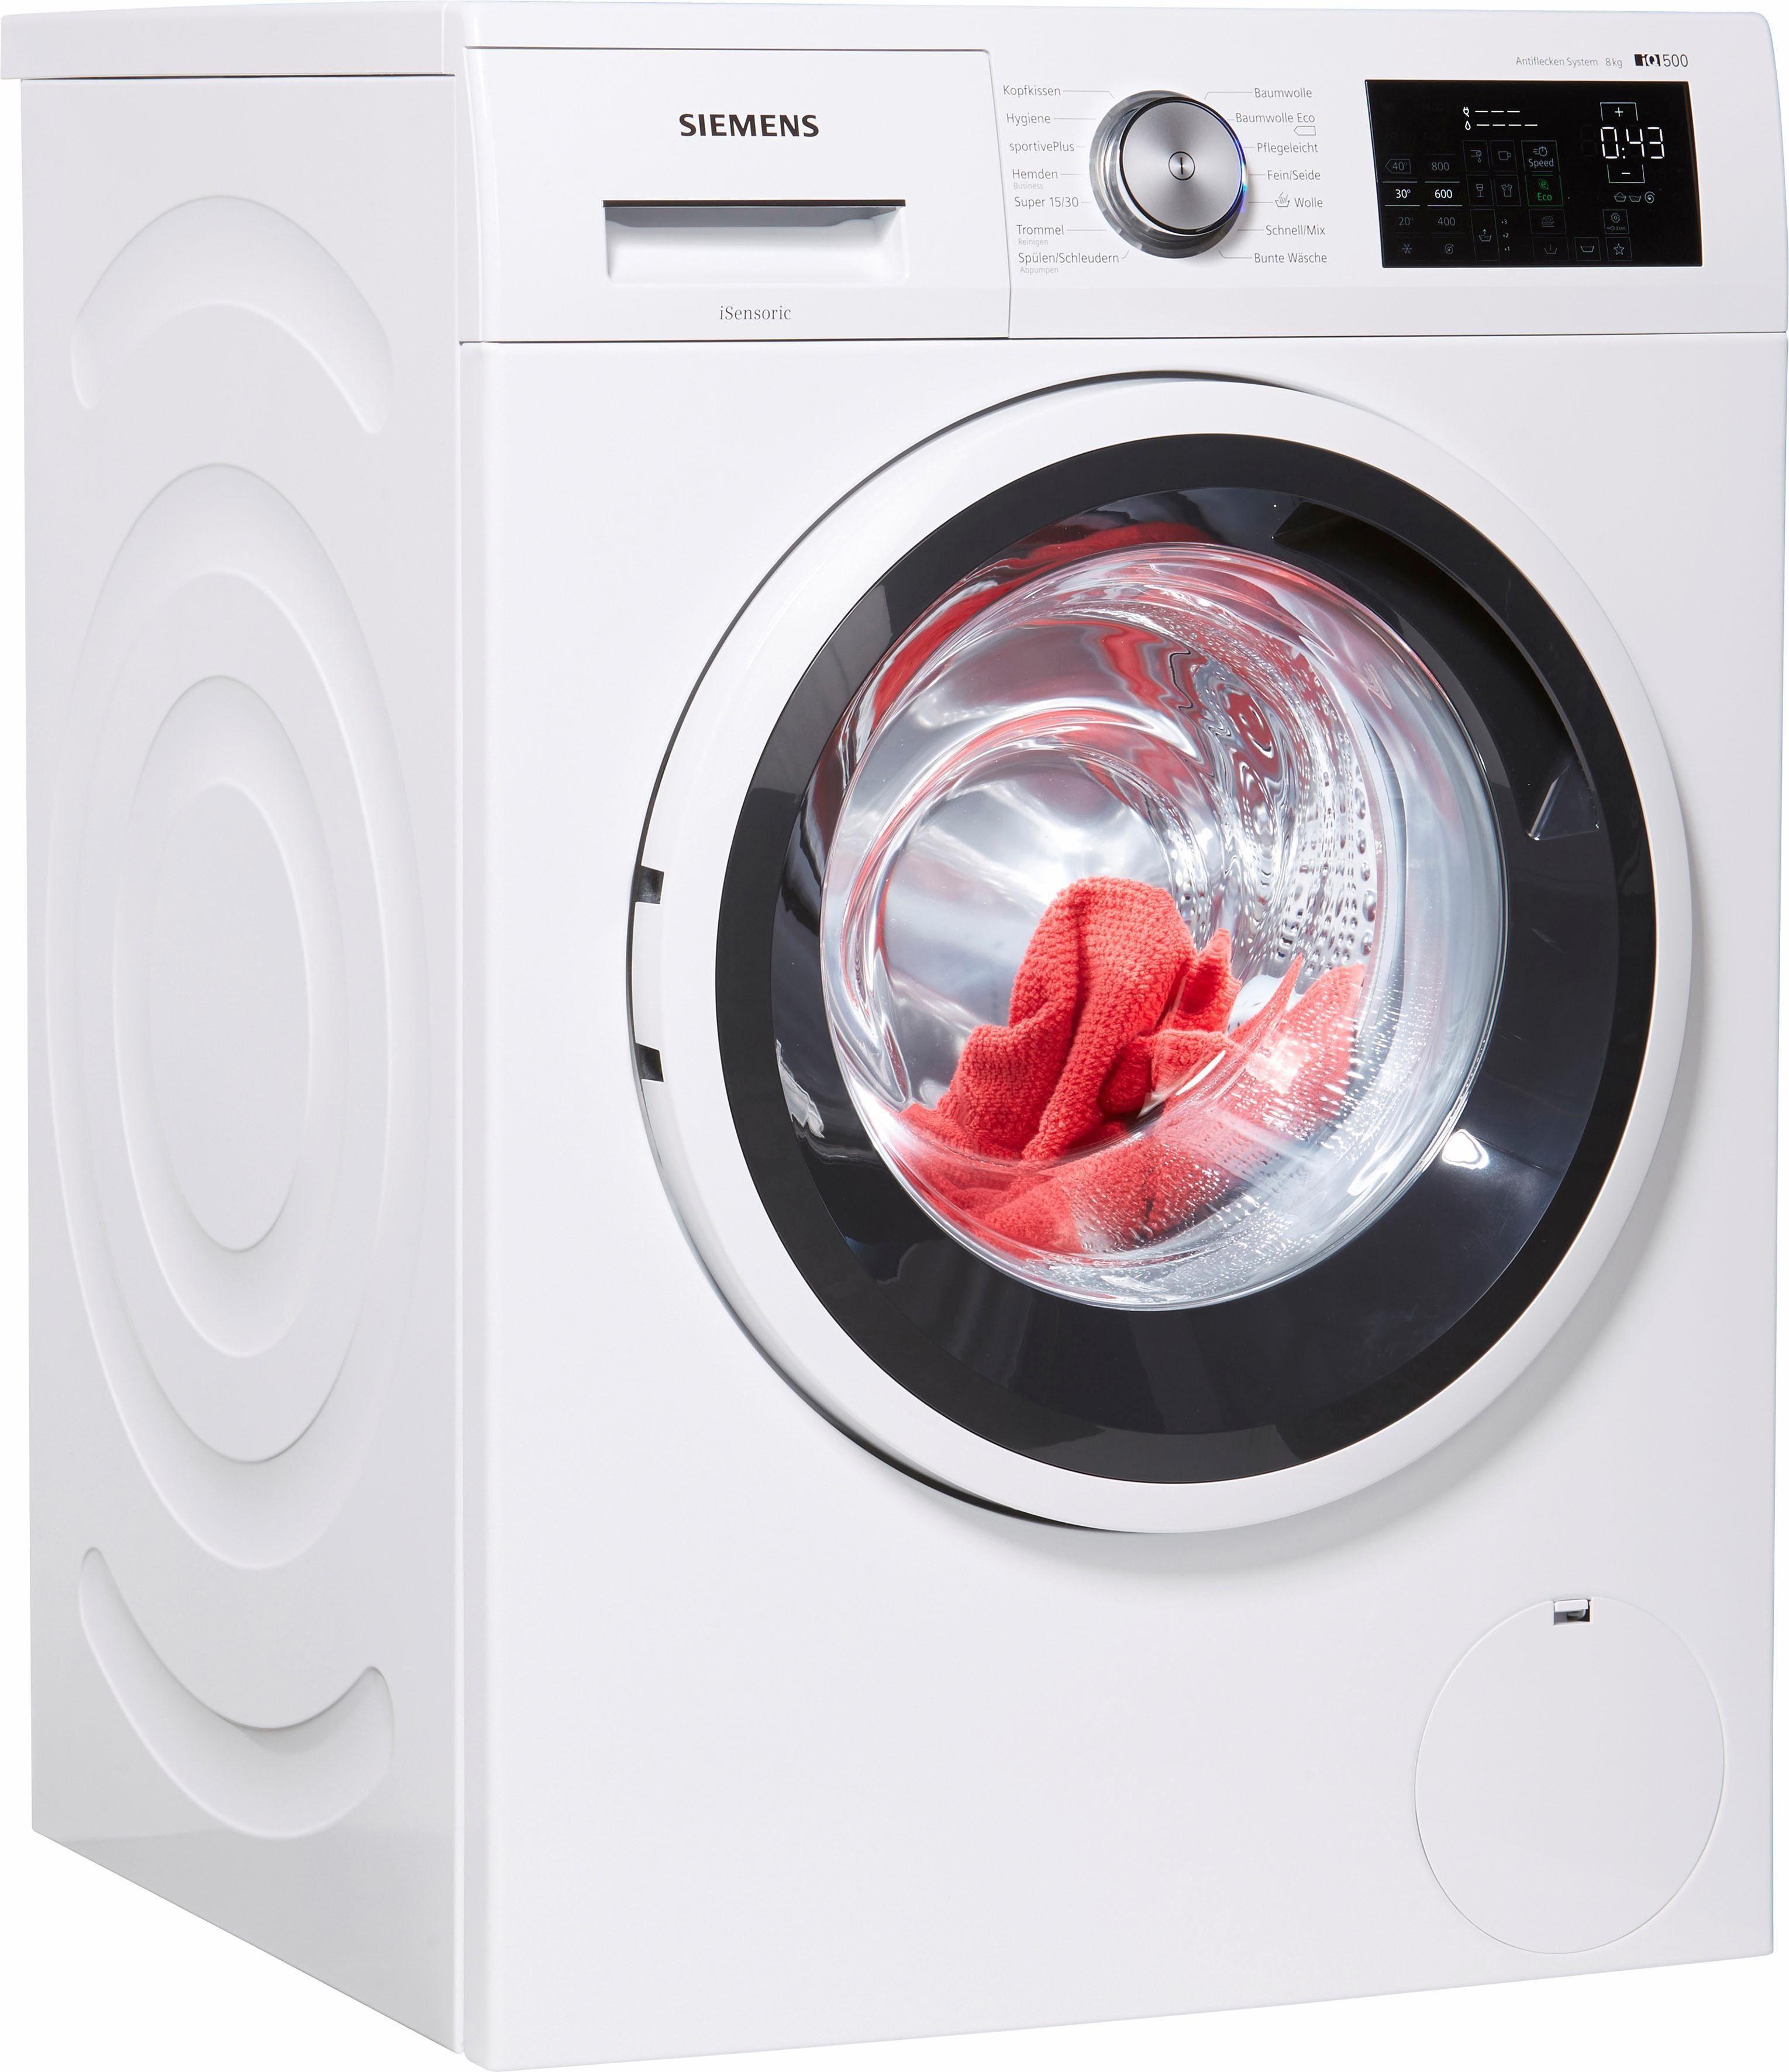 SIEMENS Waschmaschine iQ500 WM14T5ECO, 8 kg, 1400 U/Min